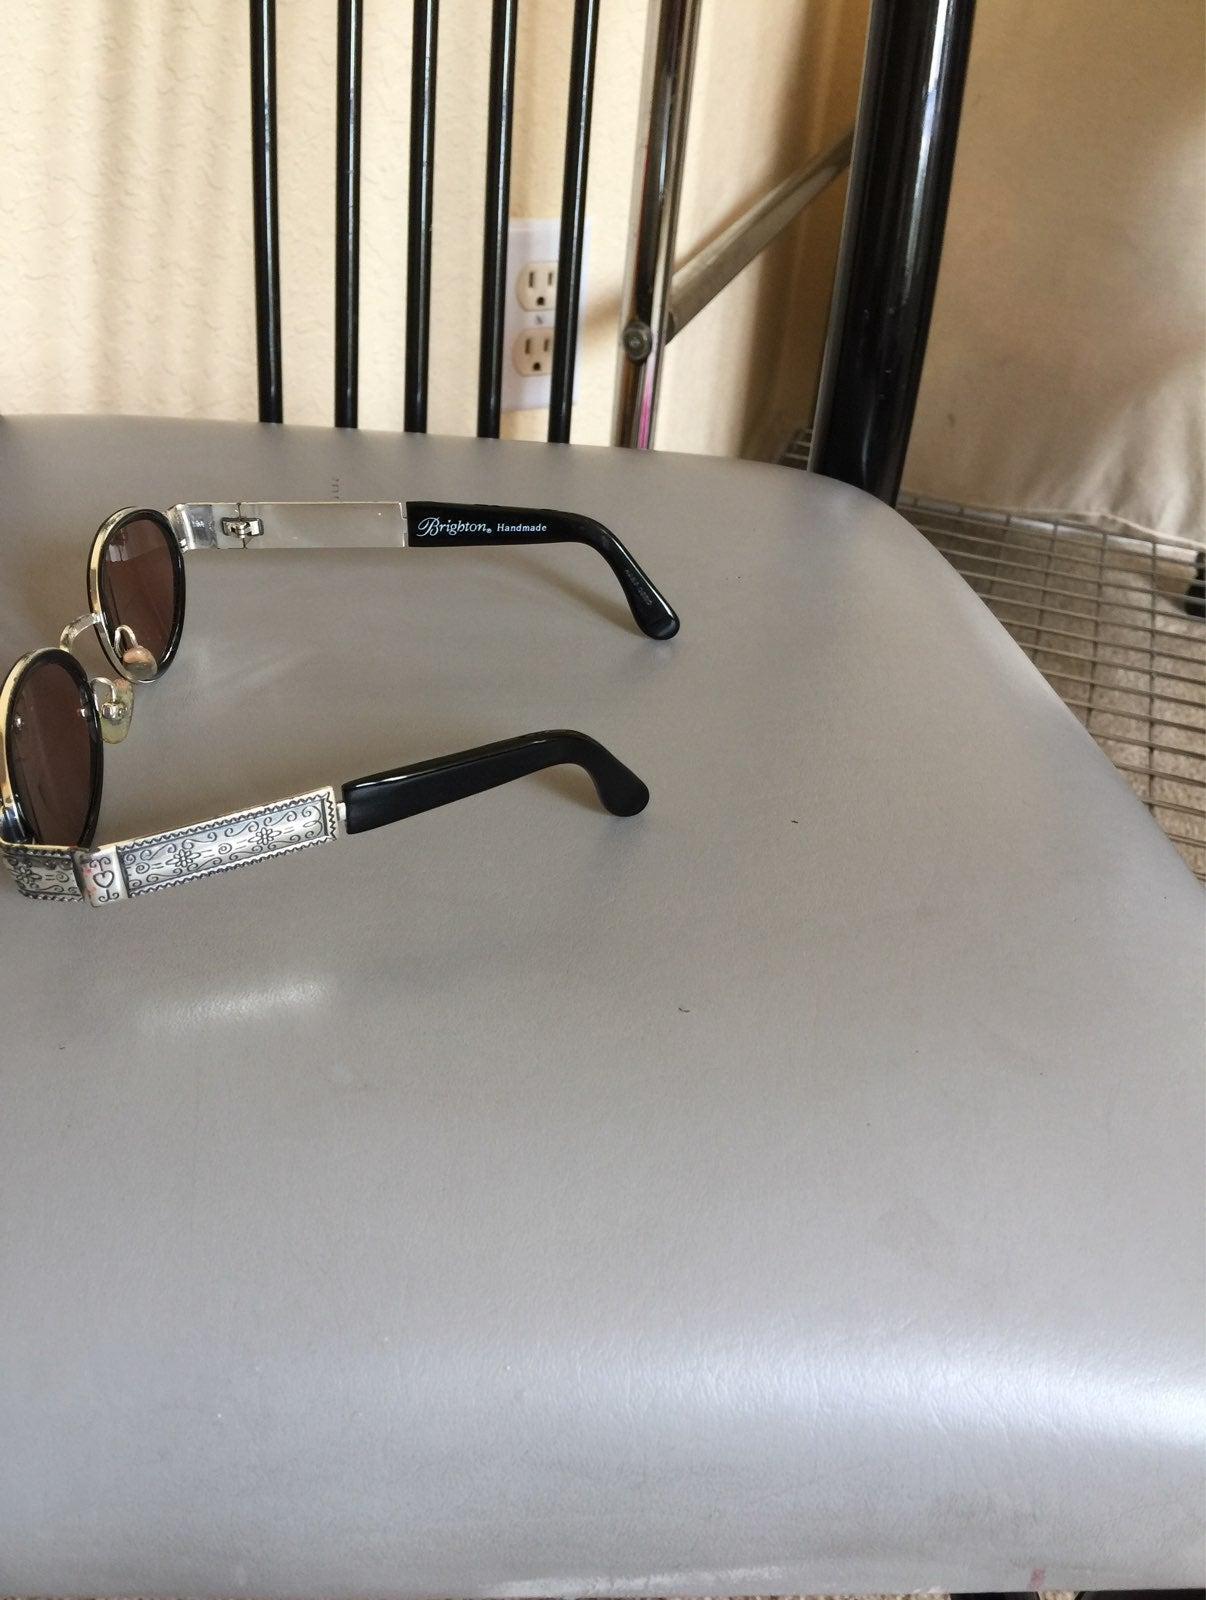 Brighton eyeglasses or sunglasses